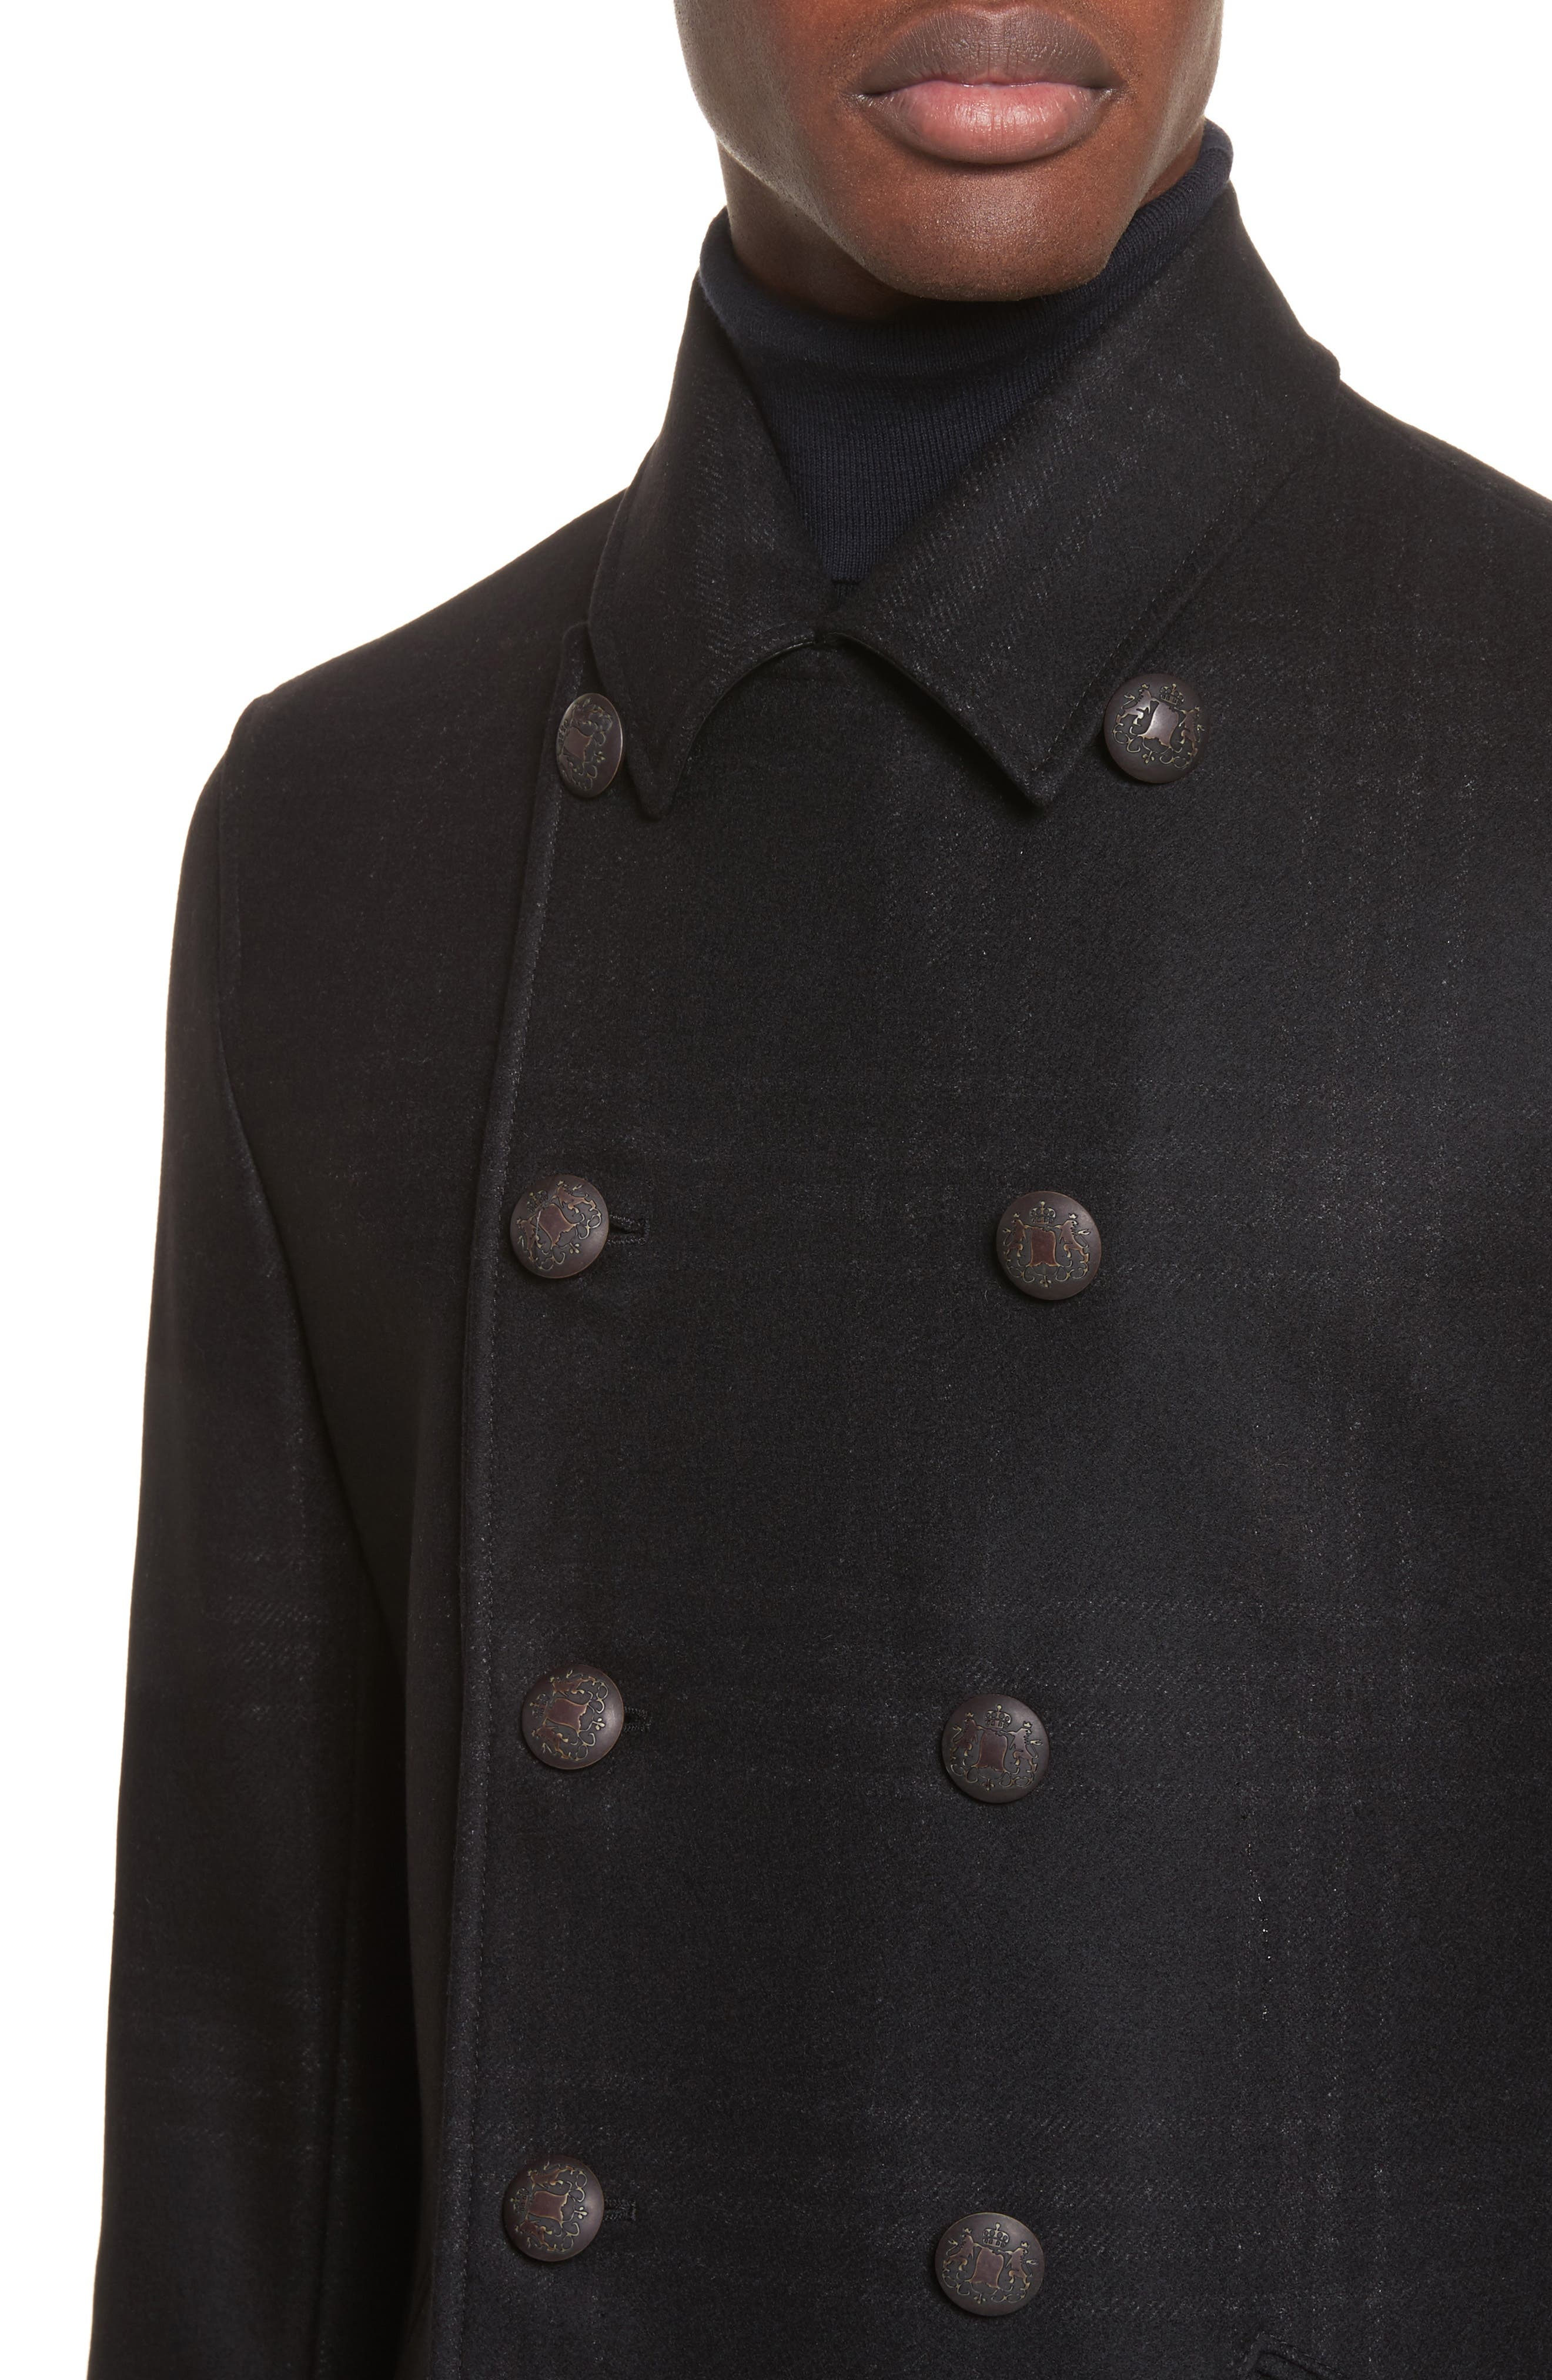 Hook Plaid Wool Blend Topcoat,                             Alternate thumbnail 4, color,                             001